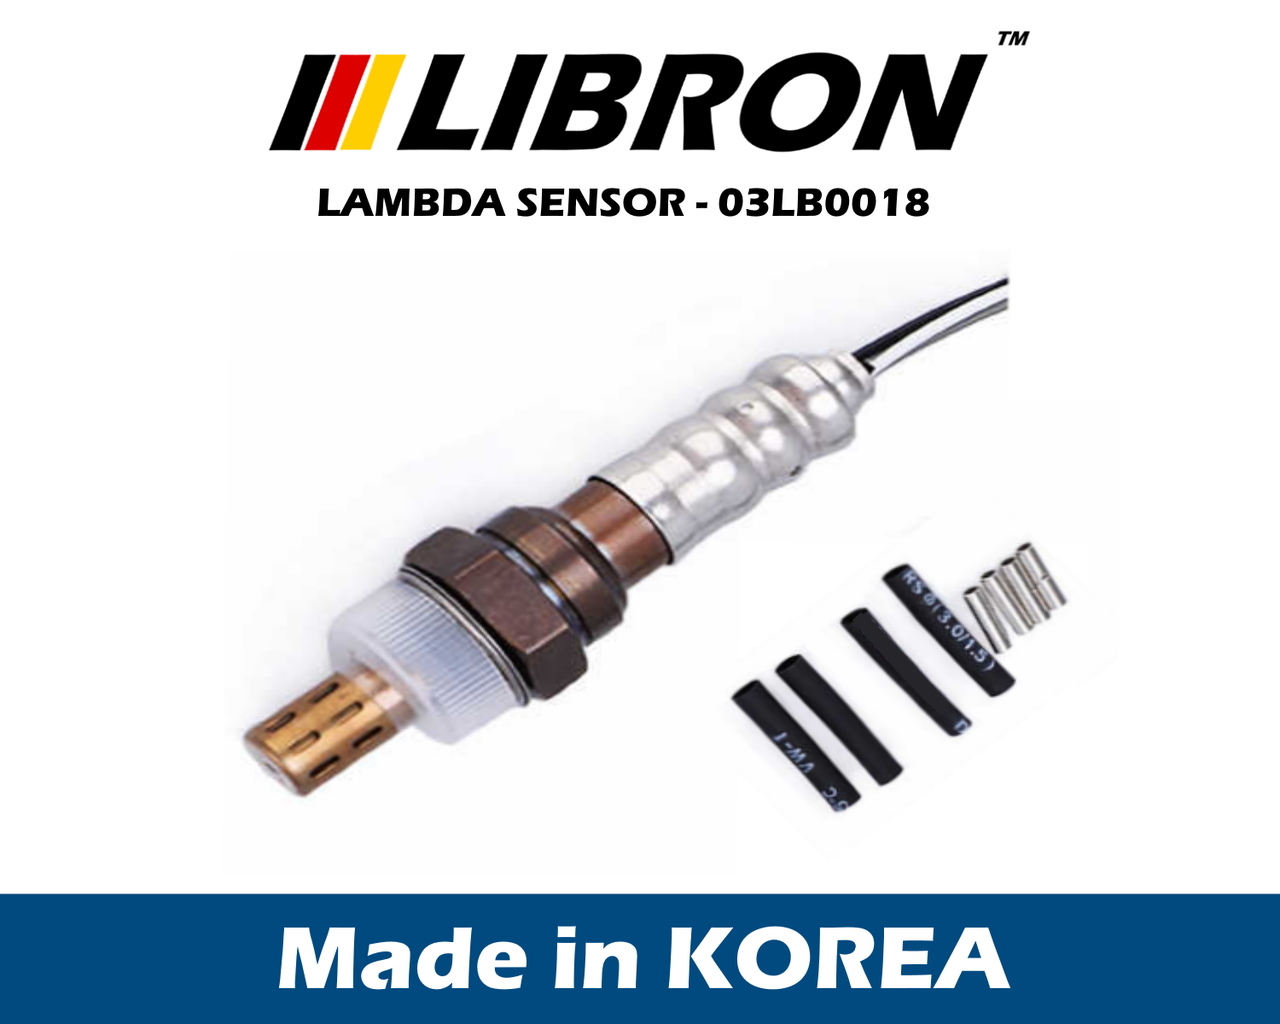 Лямбда зонд Libron 03LB0018 - Jaguar S-TYPE (X200)